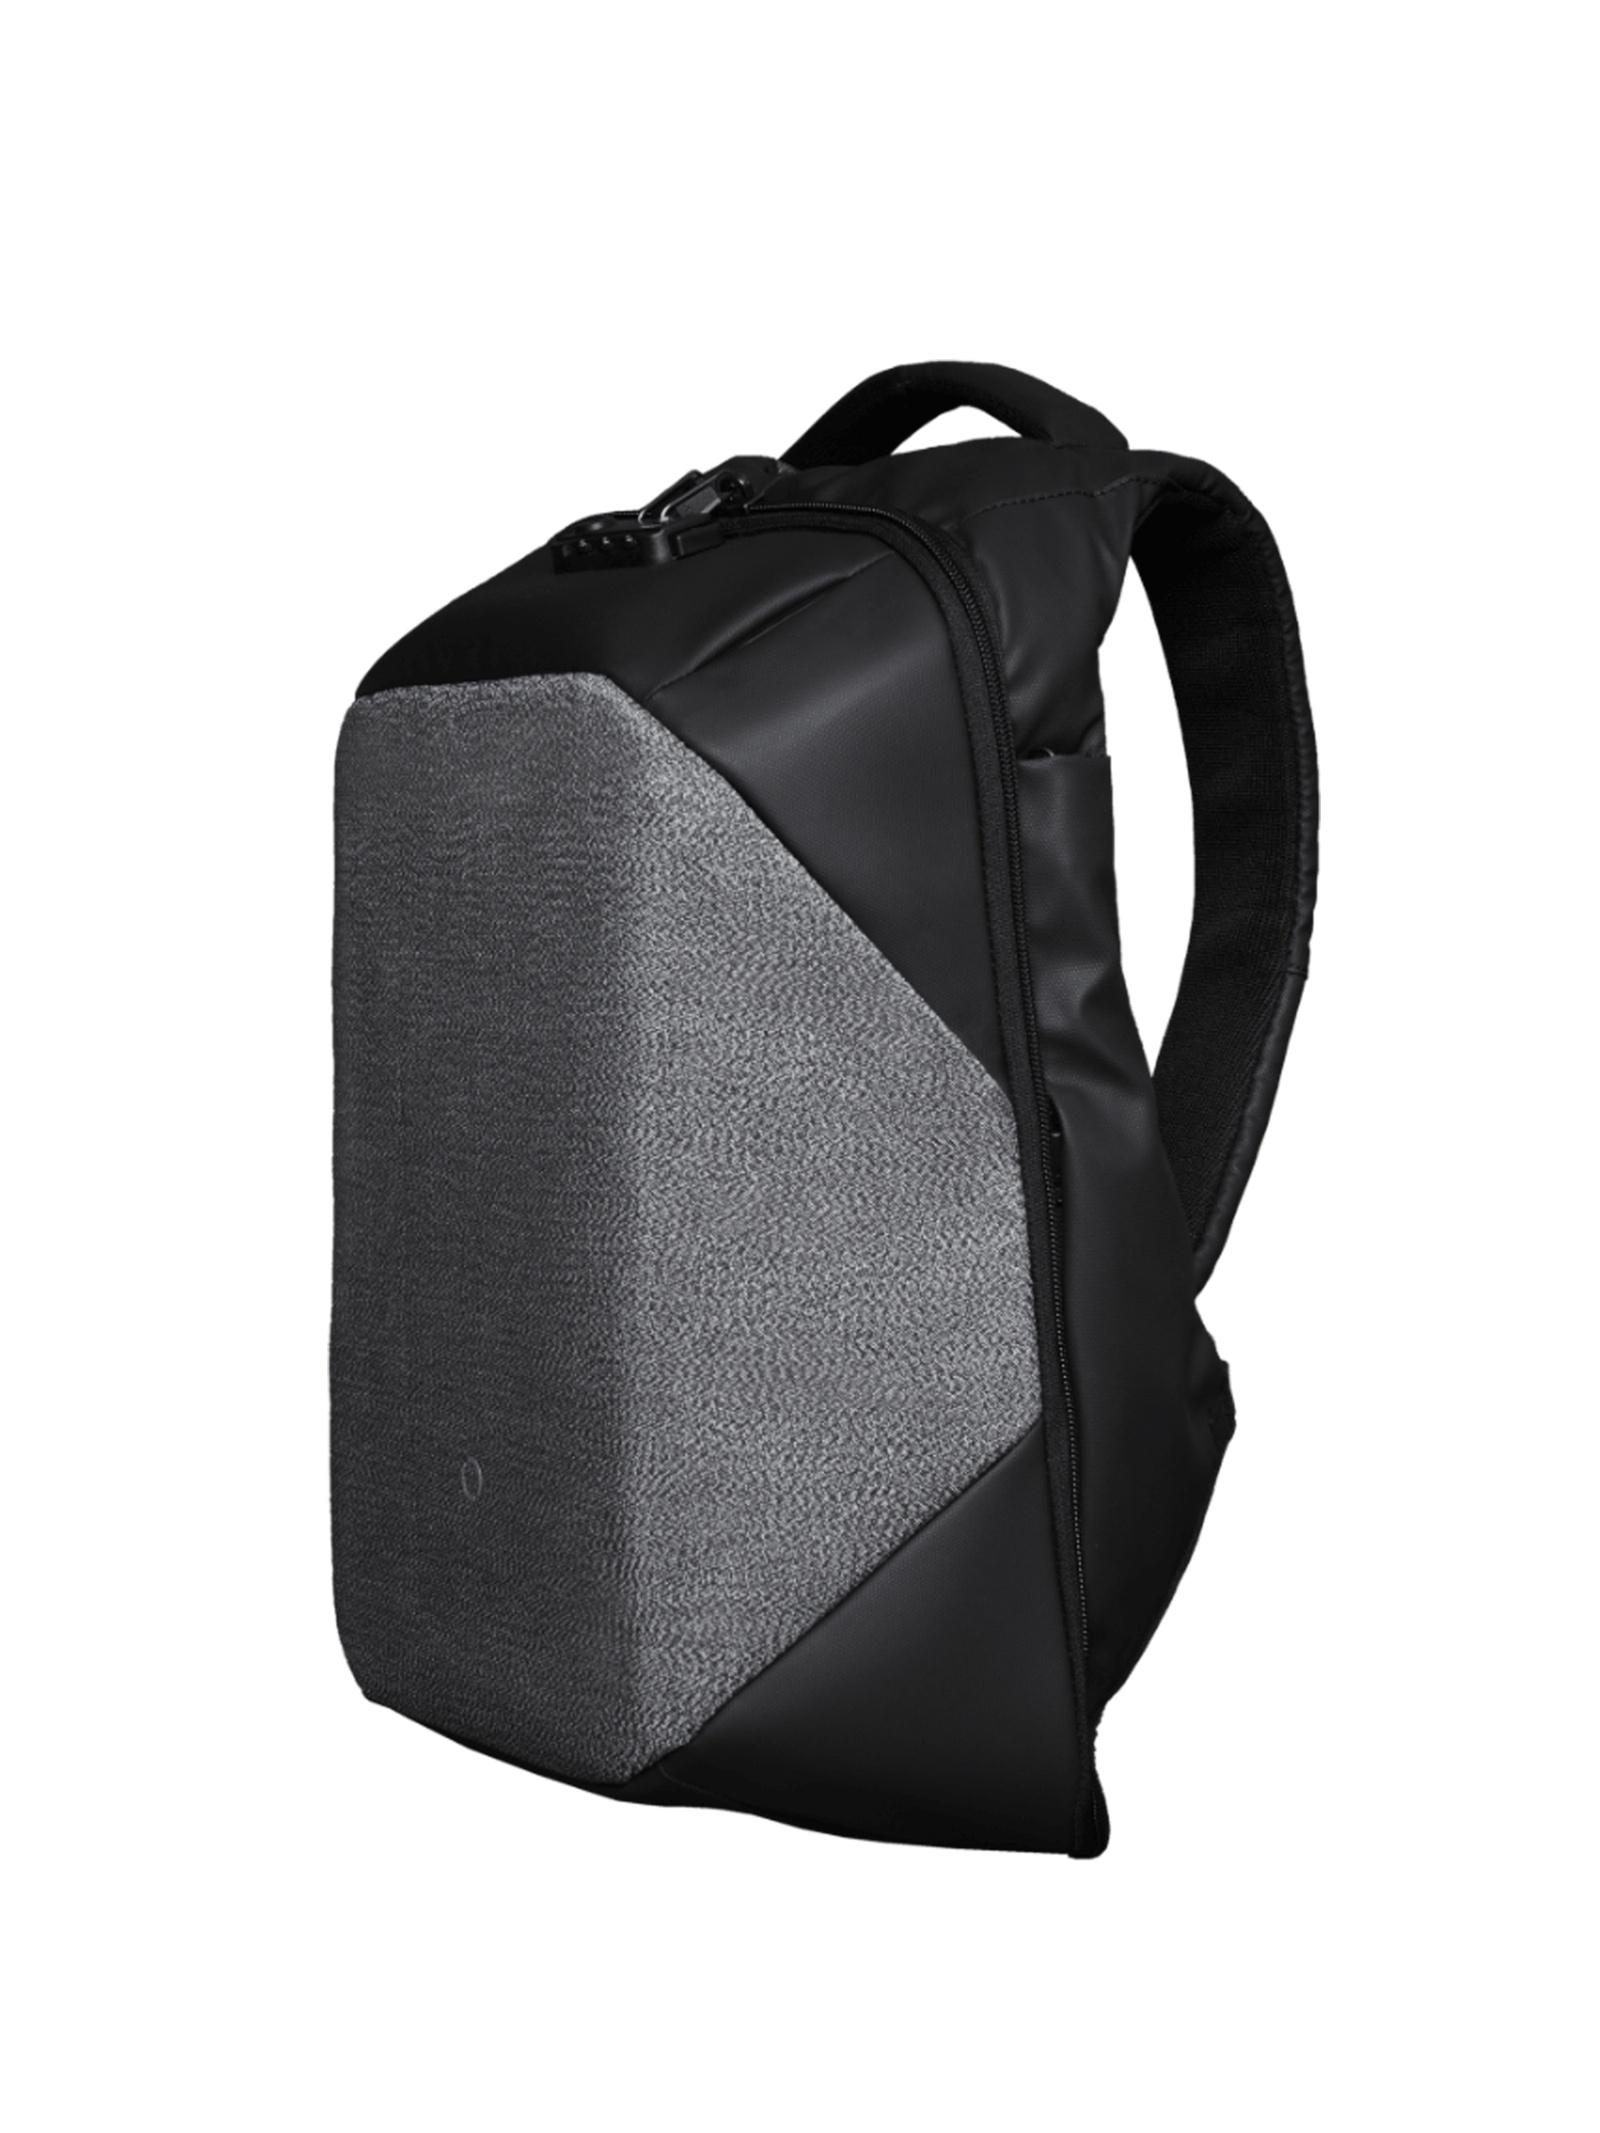 Рюкзак Korin CkickPack Pro-safe, черно-серый рюкзак korin design clickpack gray серый